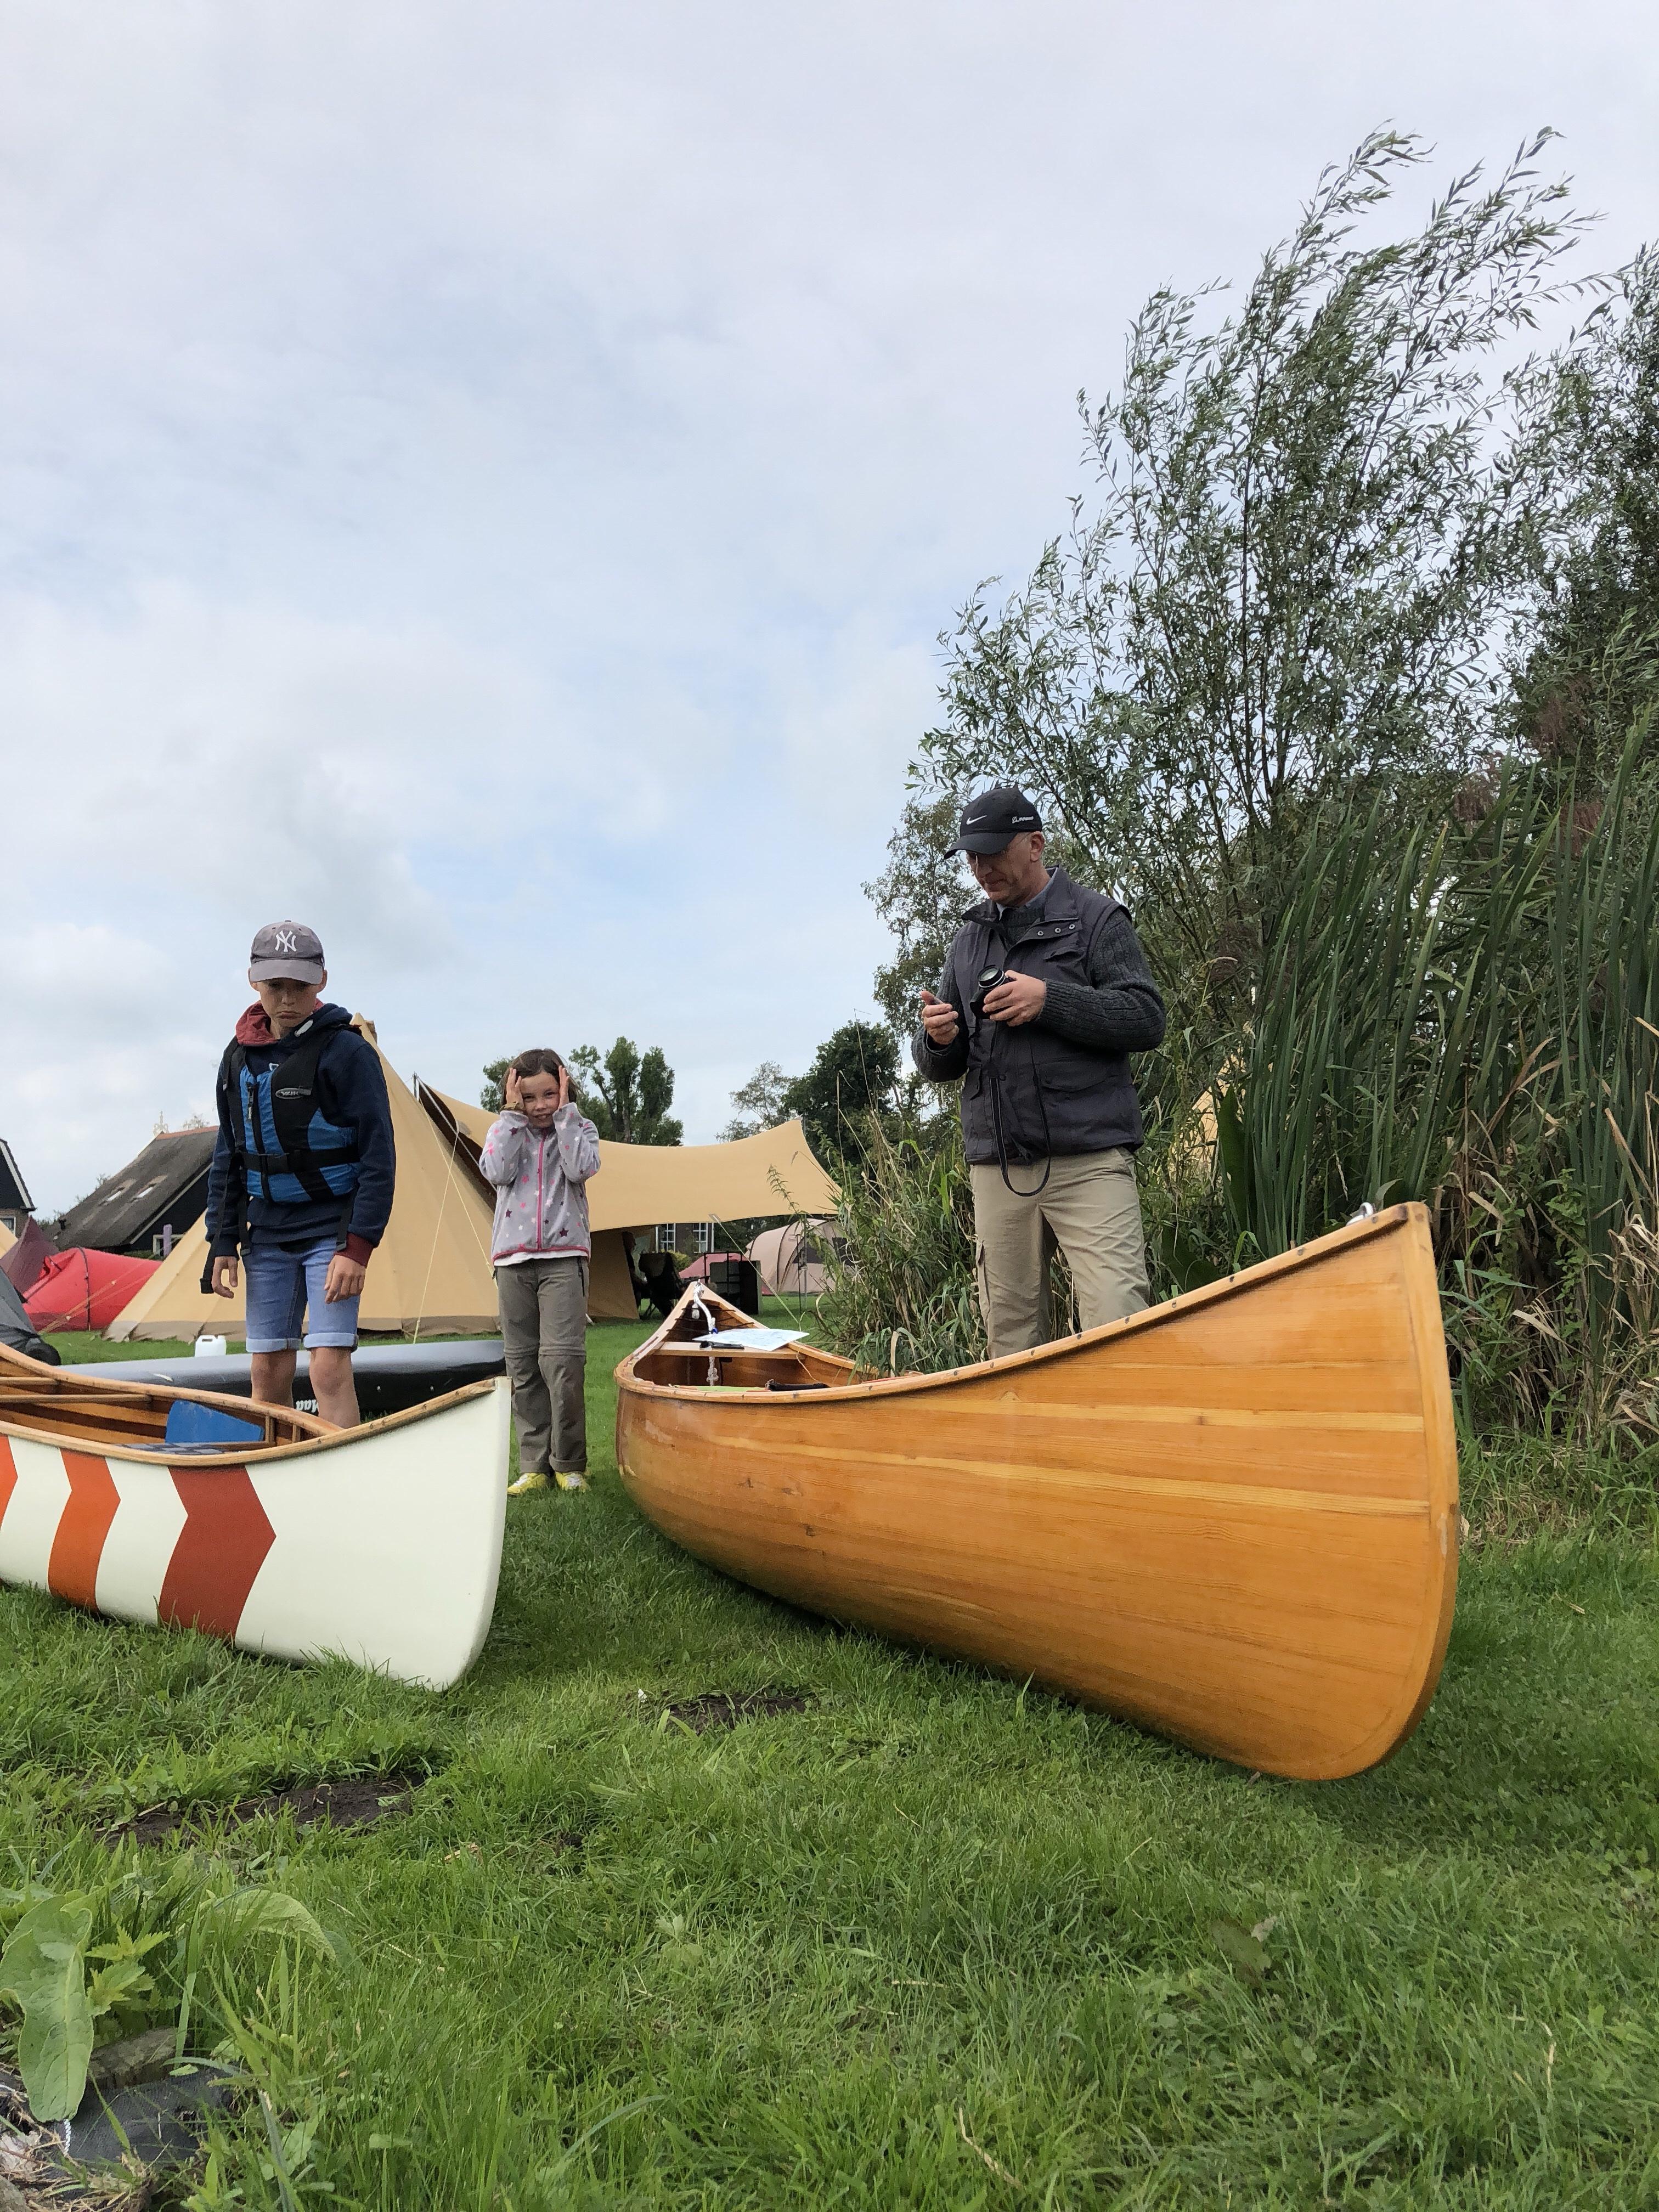 Emiel from FreeRanger Canoe and our Cedar